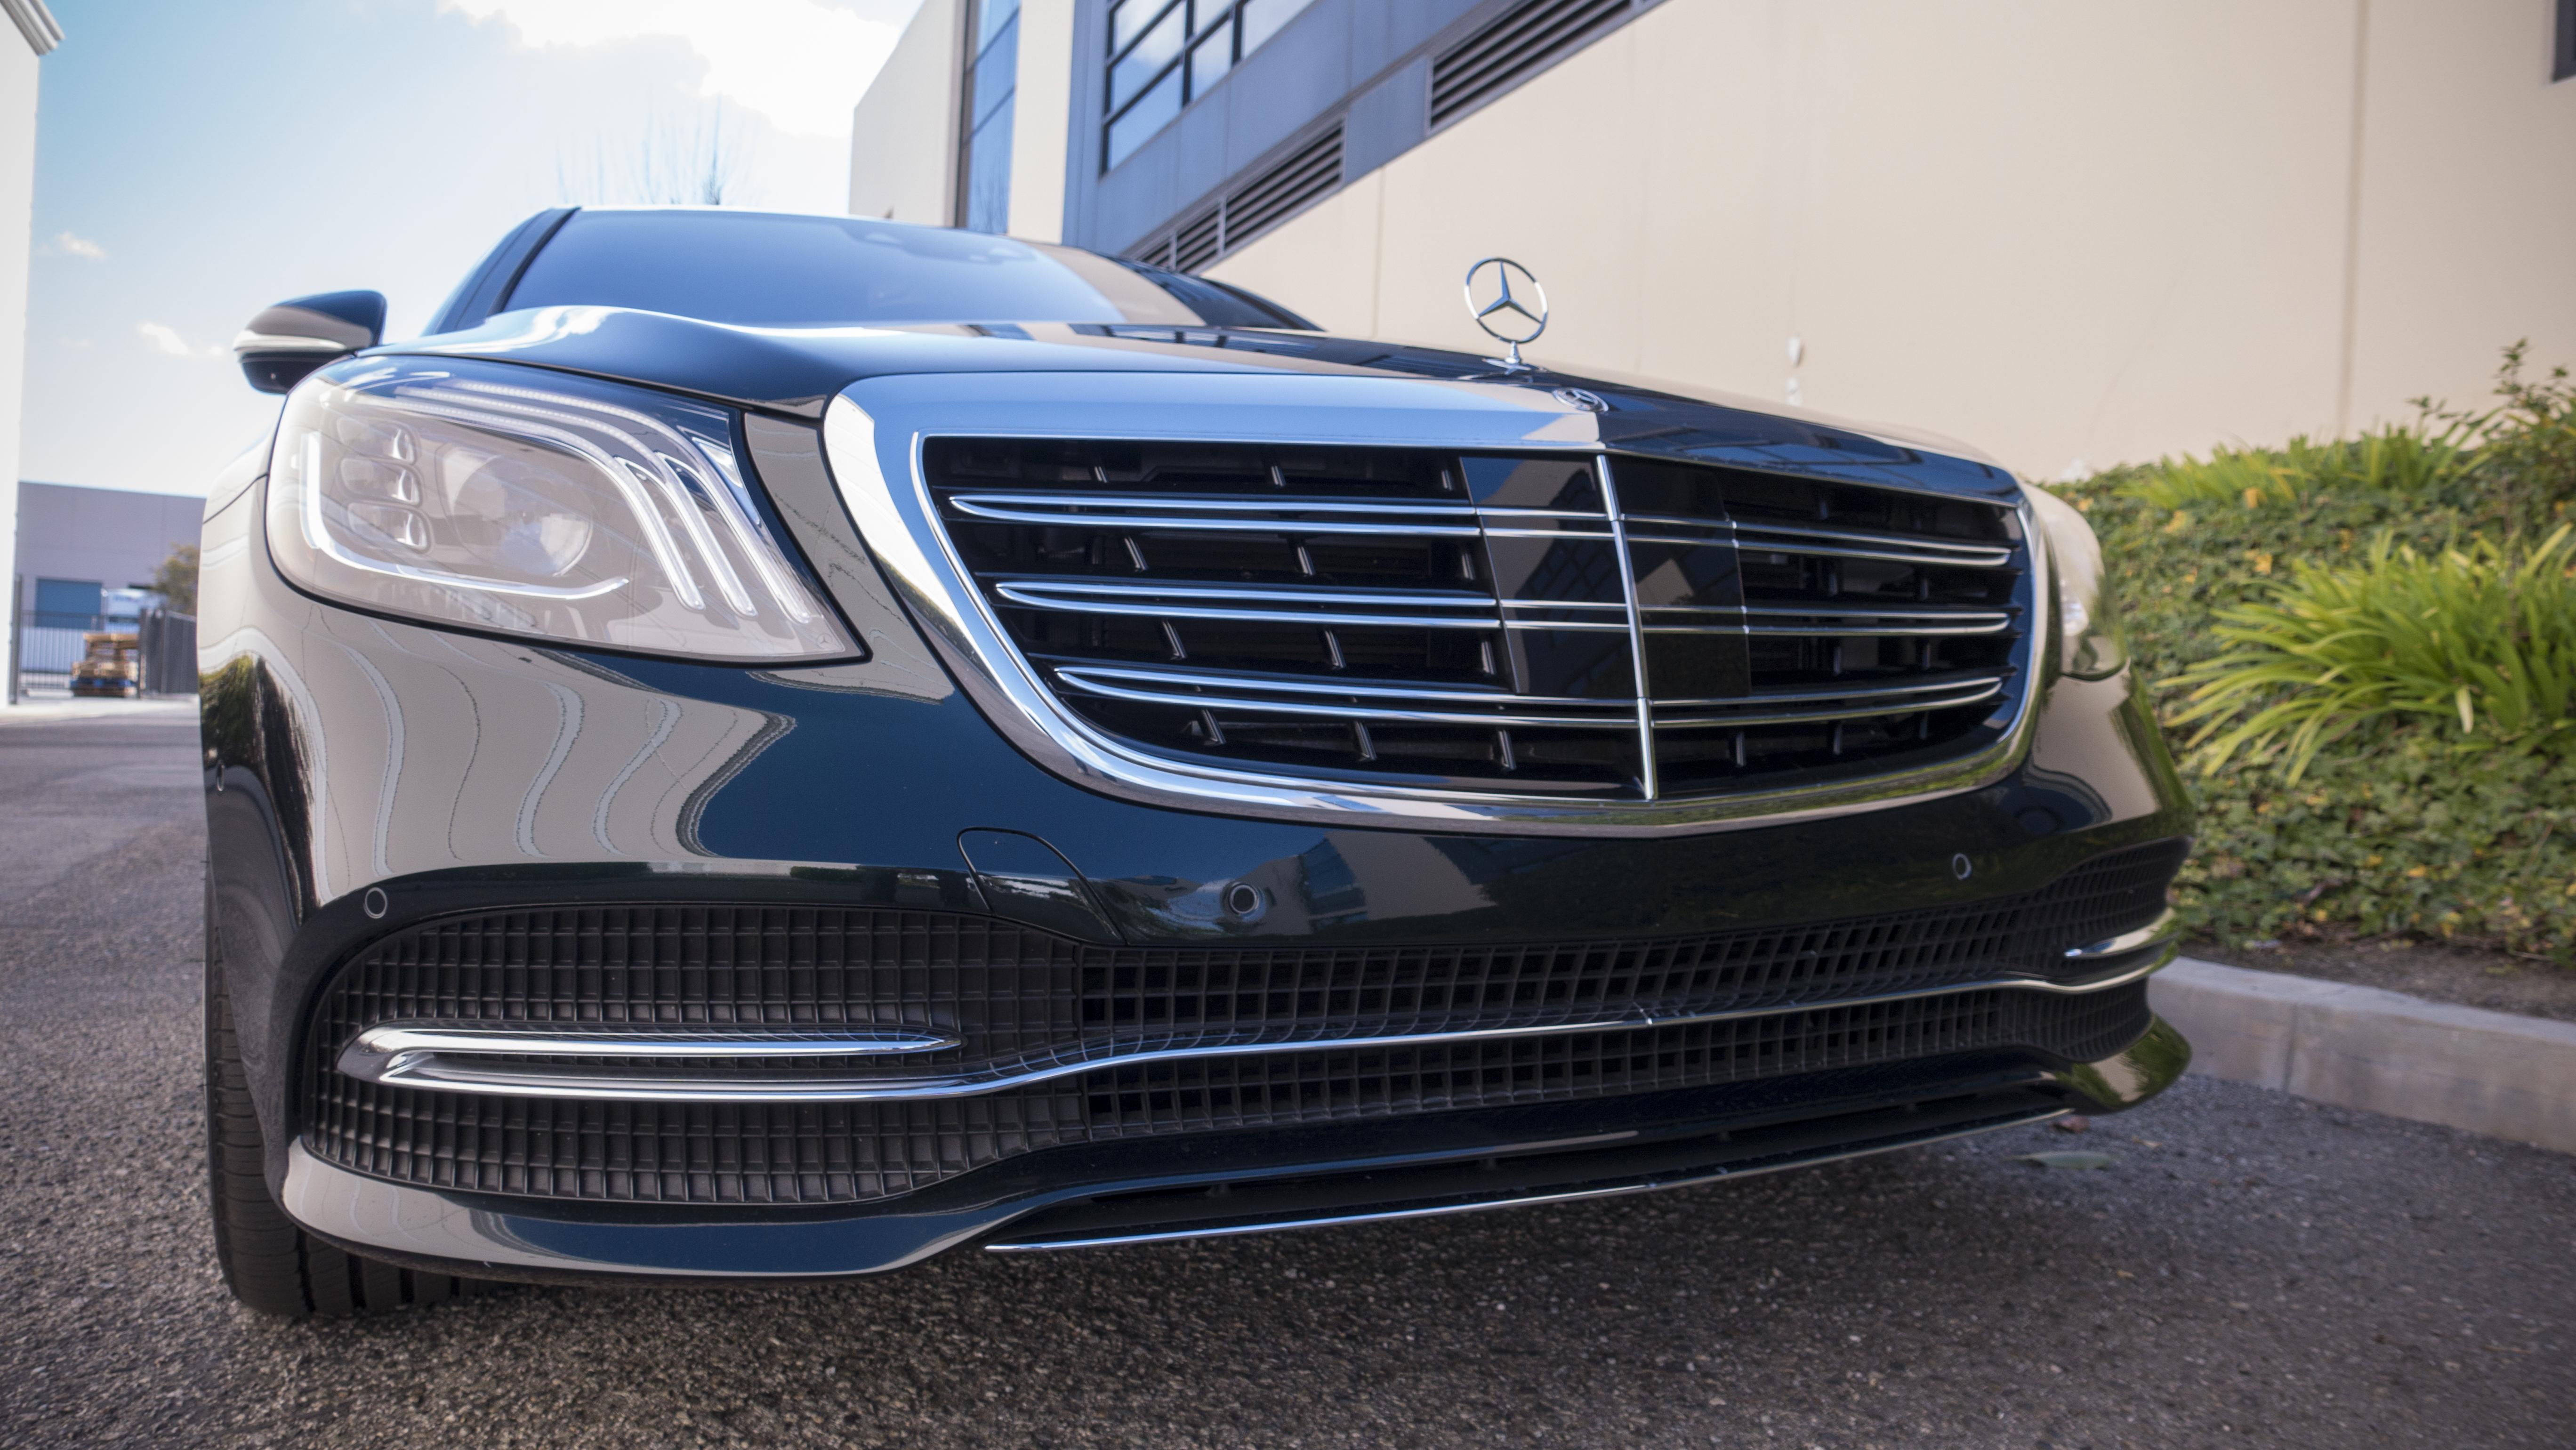 Mercedes-Benz 2018 S450 Sedan